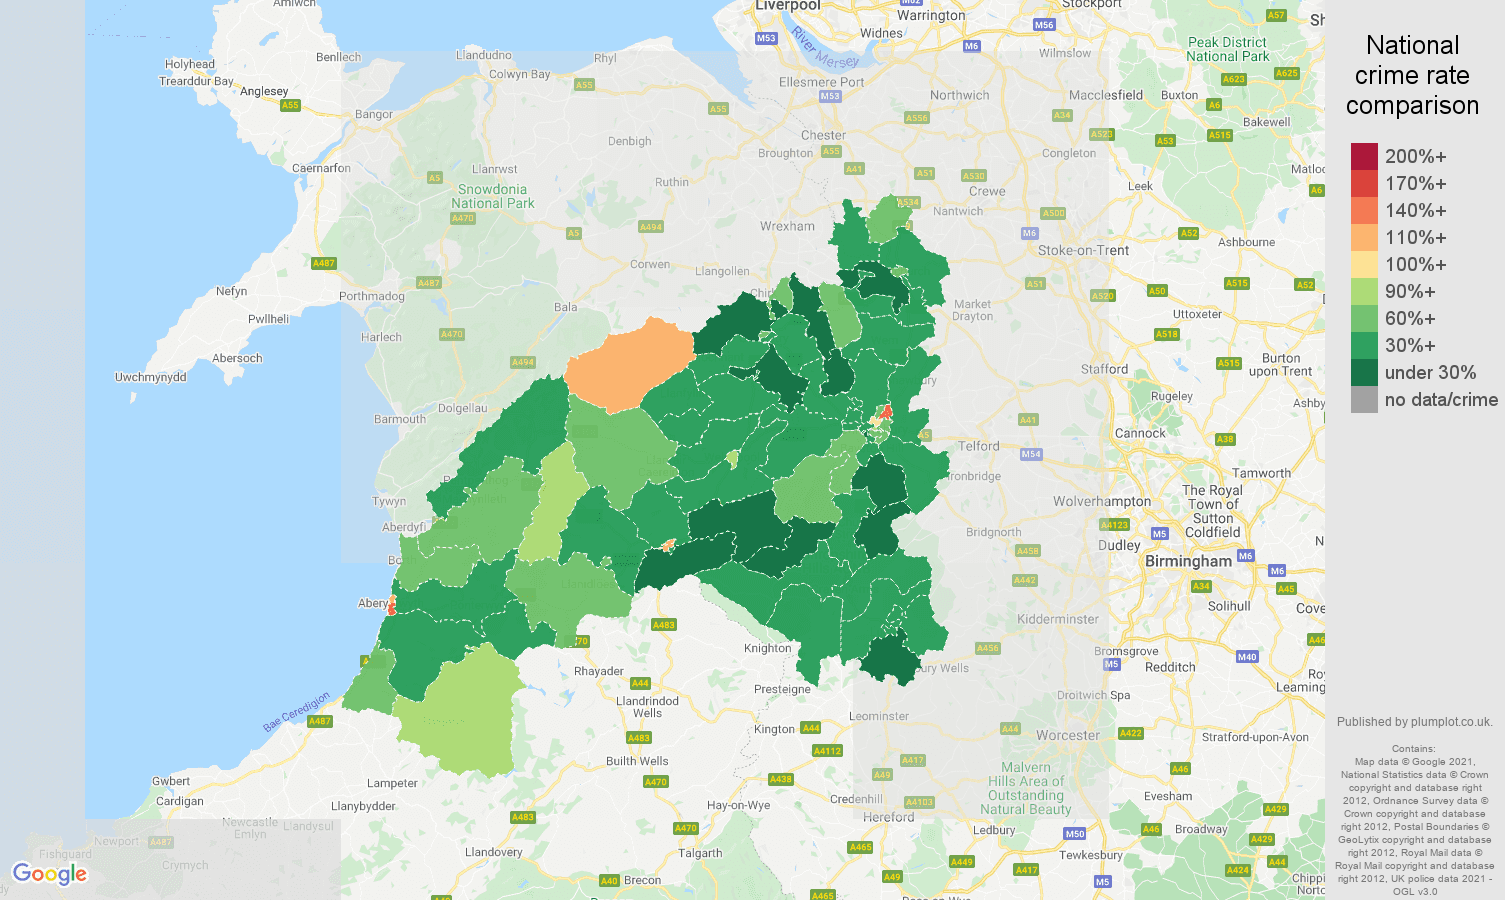 Shrewsbury antisocial behaviour crime rate comparison map